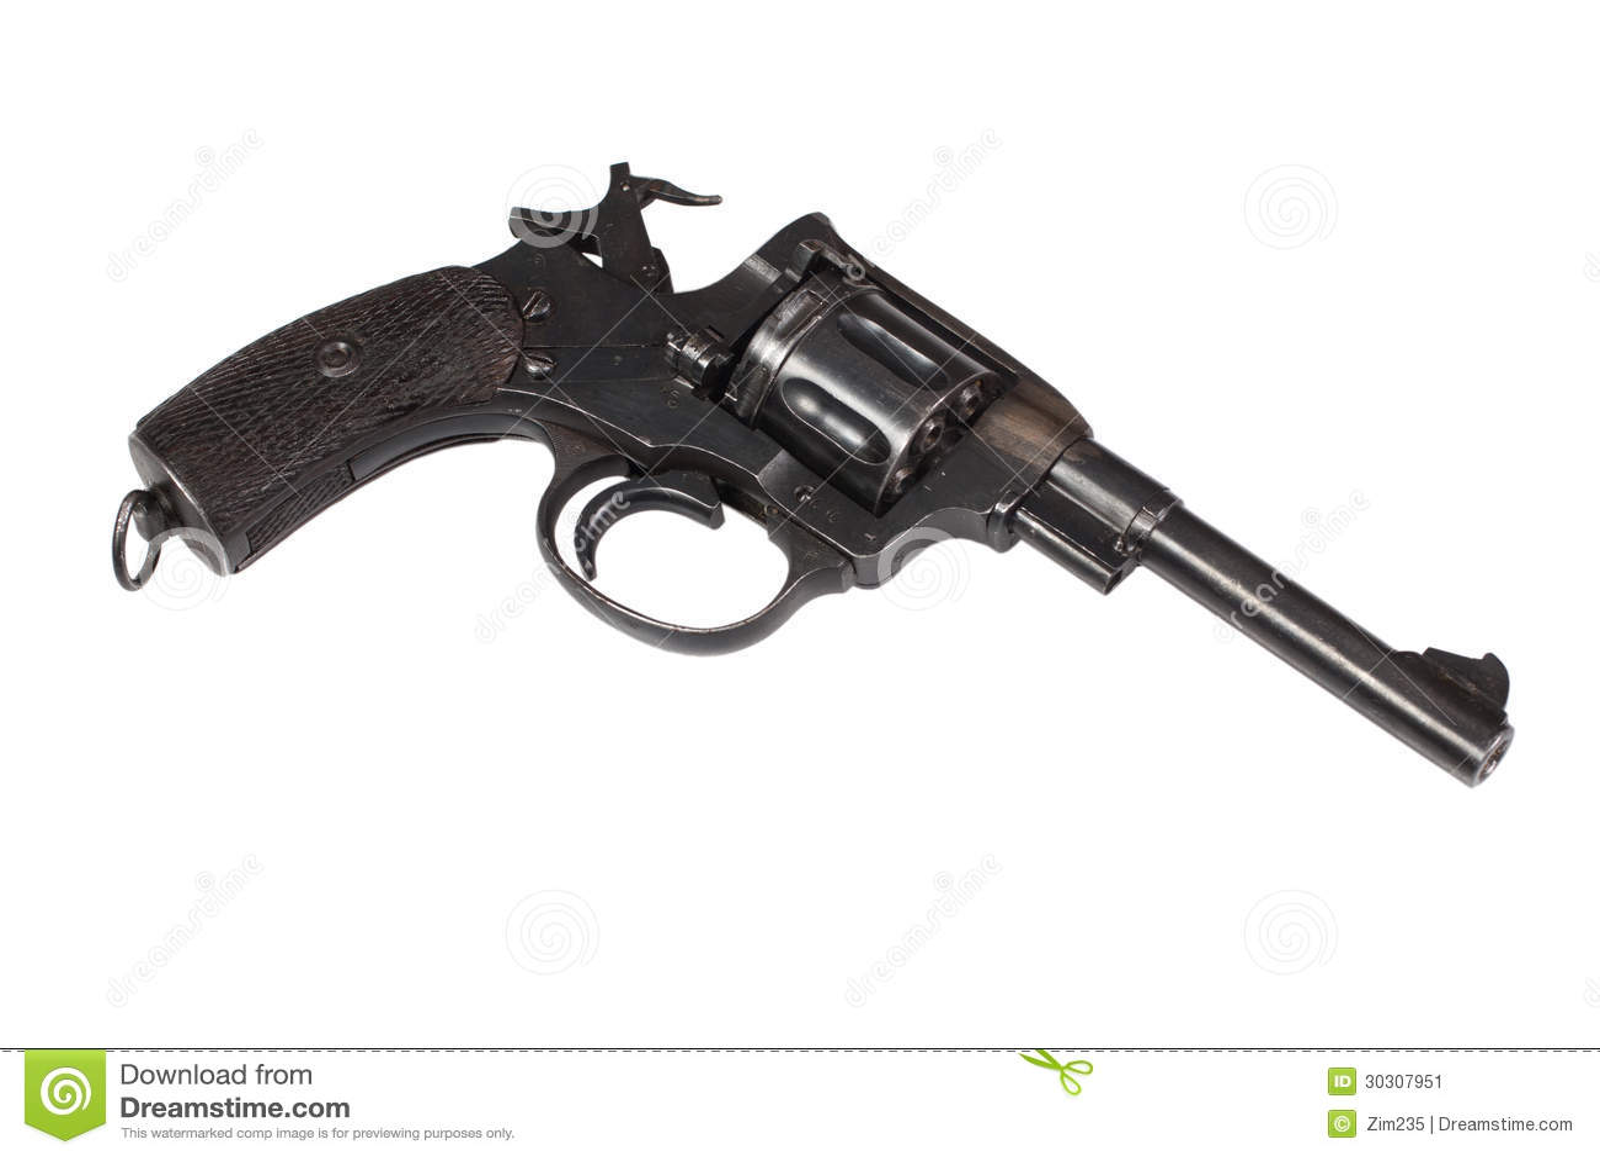 gun white background - photo #20